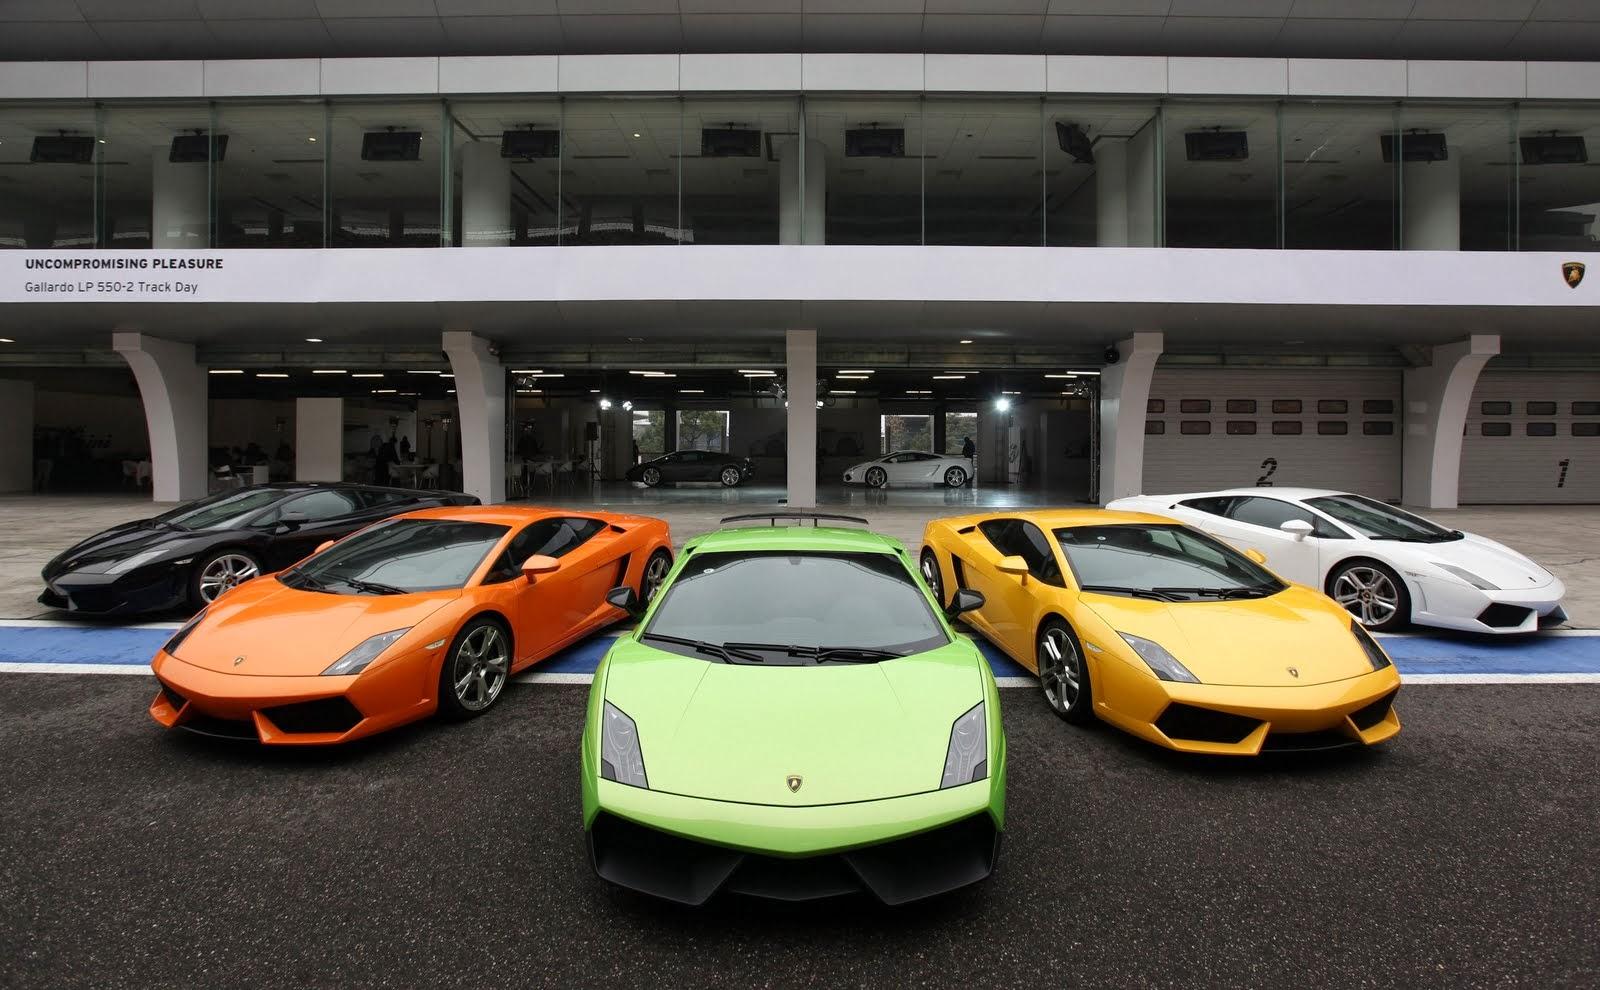 Lamborghini Gallardo LP 550-2 free download